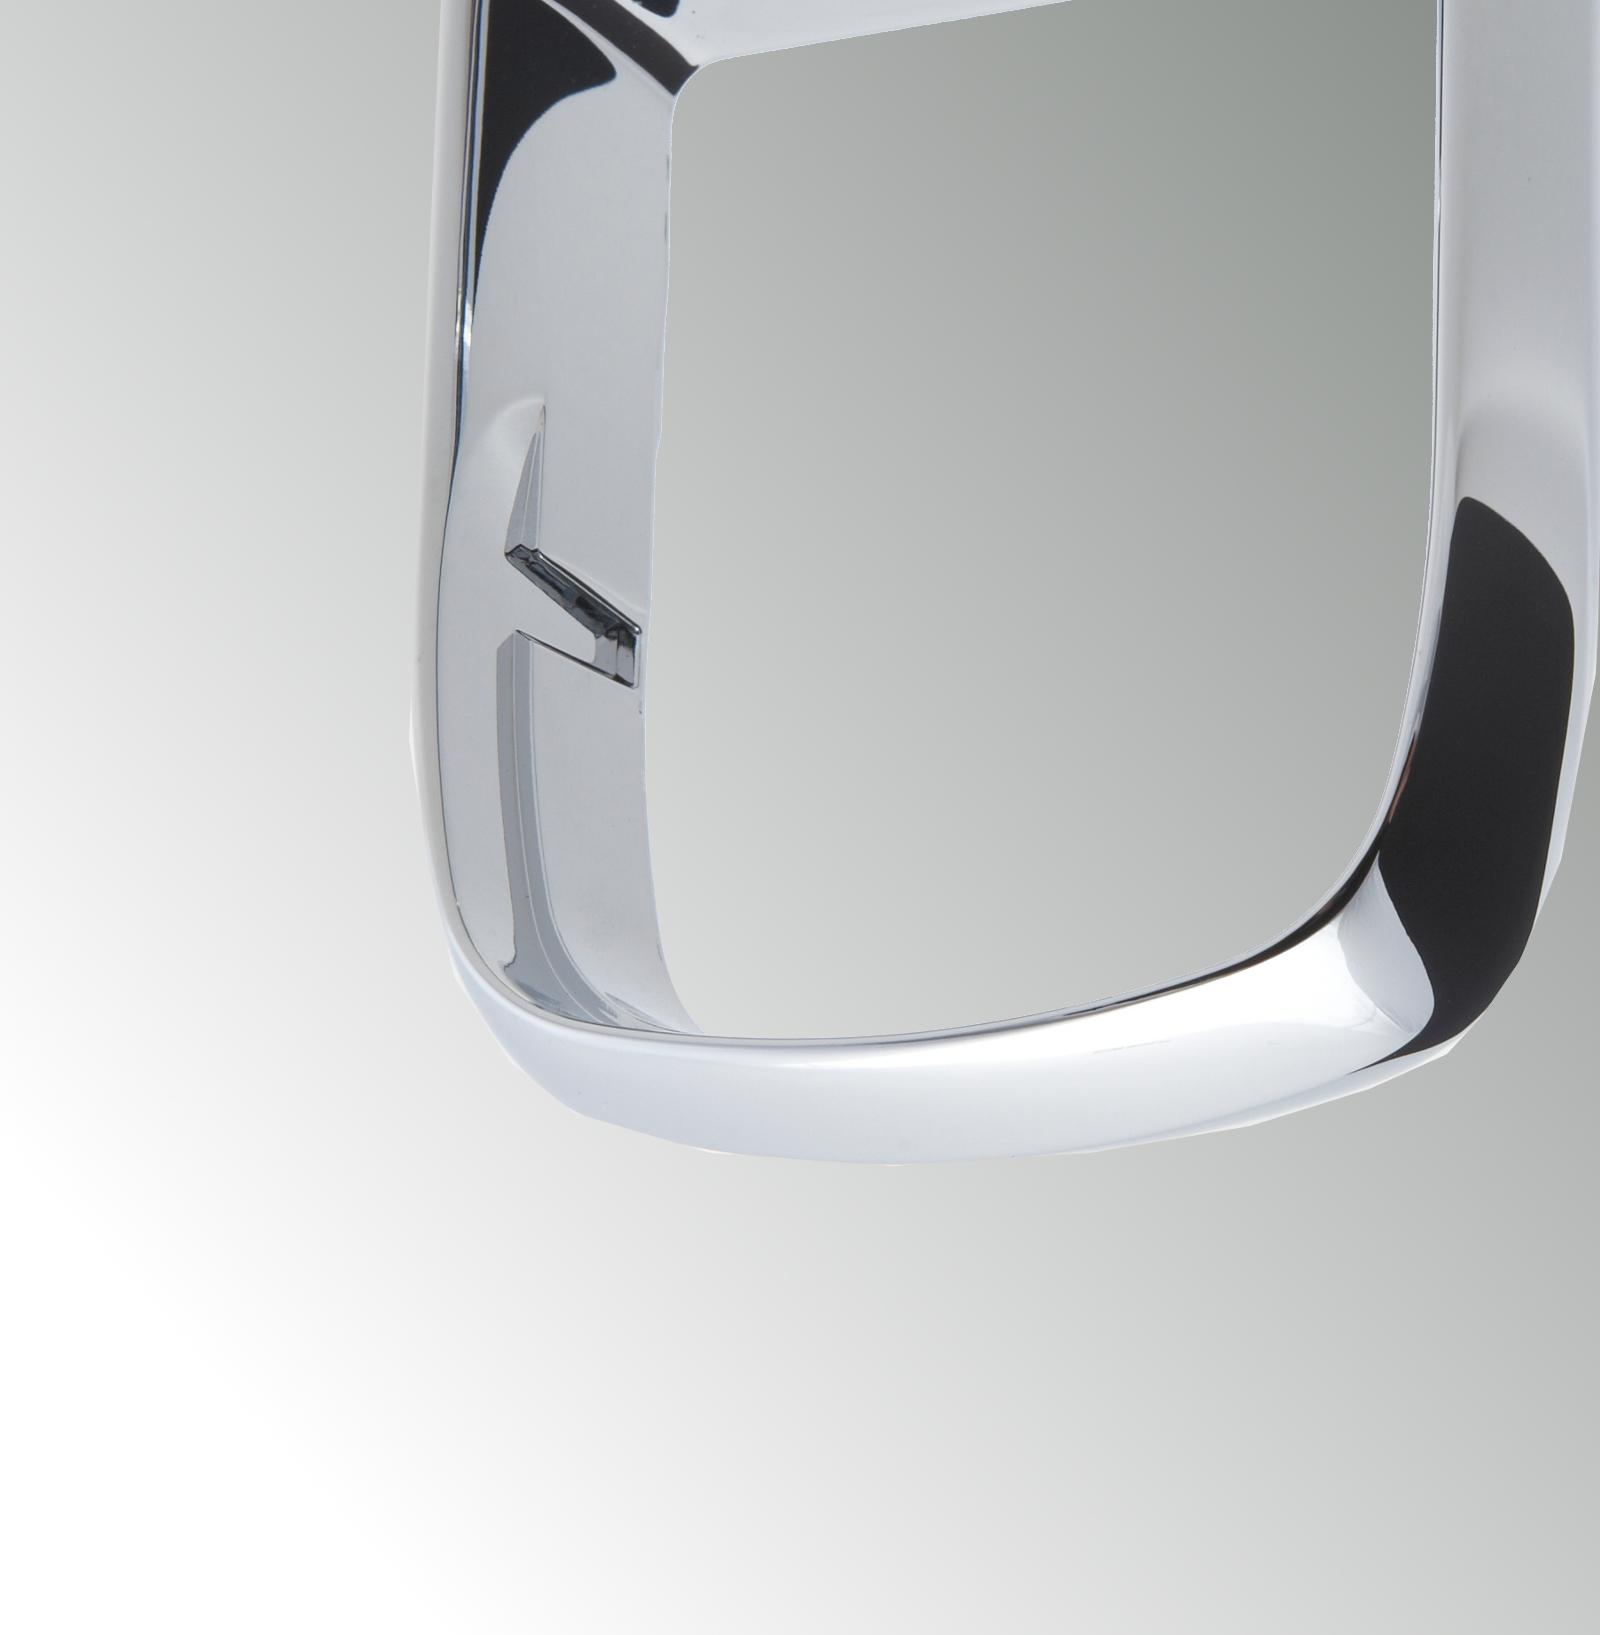 https://hdo-gmbh.com/wp-content/uploads/HDO_Sanitaer_Accessoires_Glashalterrahmen.jpg